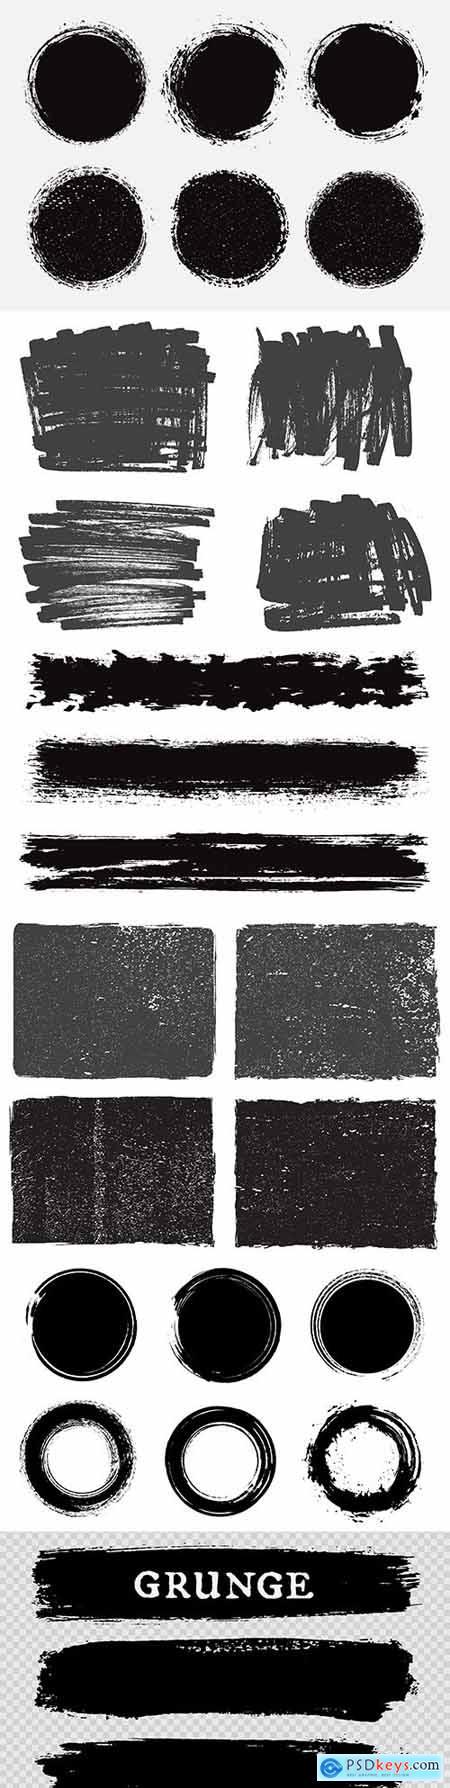 Grunge textured black scratches collection elements 3